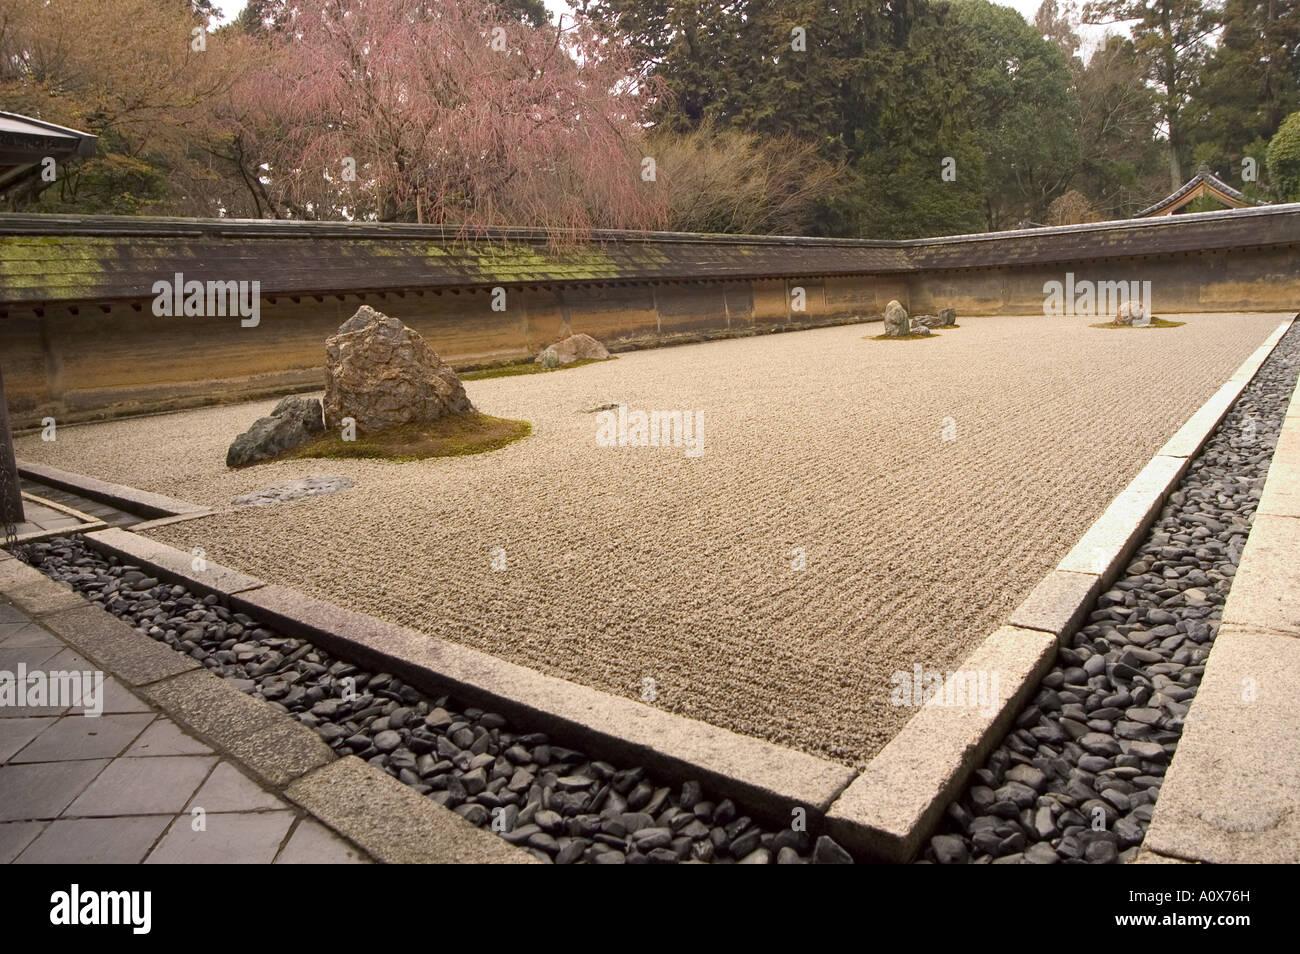 Ryoanji temple dry stone garden and blossom unesco world heritage ryoanji temple dry stone garden and blossom unesco world heritage site kyoto city honshu island japan asia workwithnaturefo